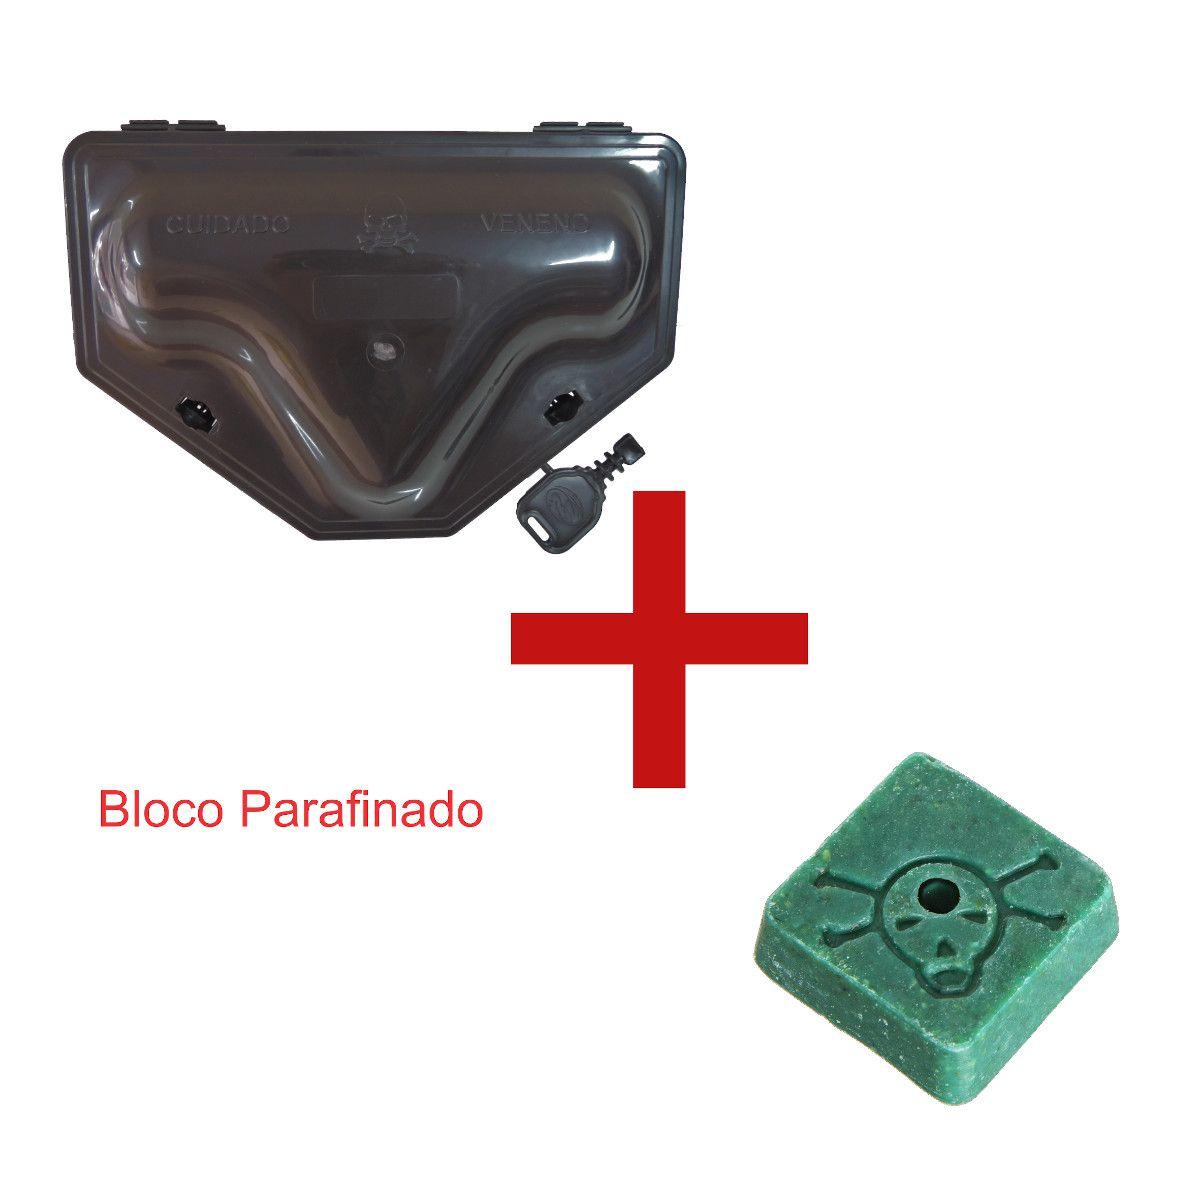 KIT 25 Porta Iscas Armadilha Mata Ratos 2 TRAVAS c/ Chave